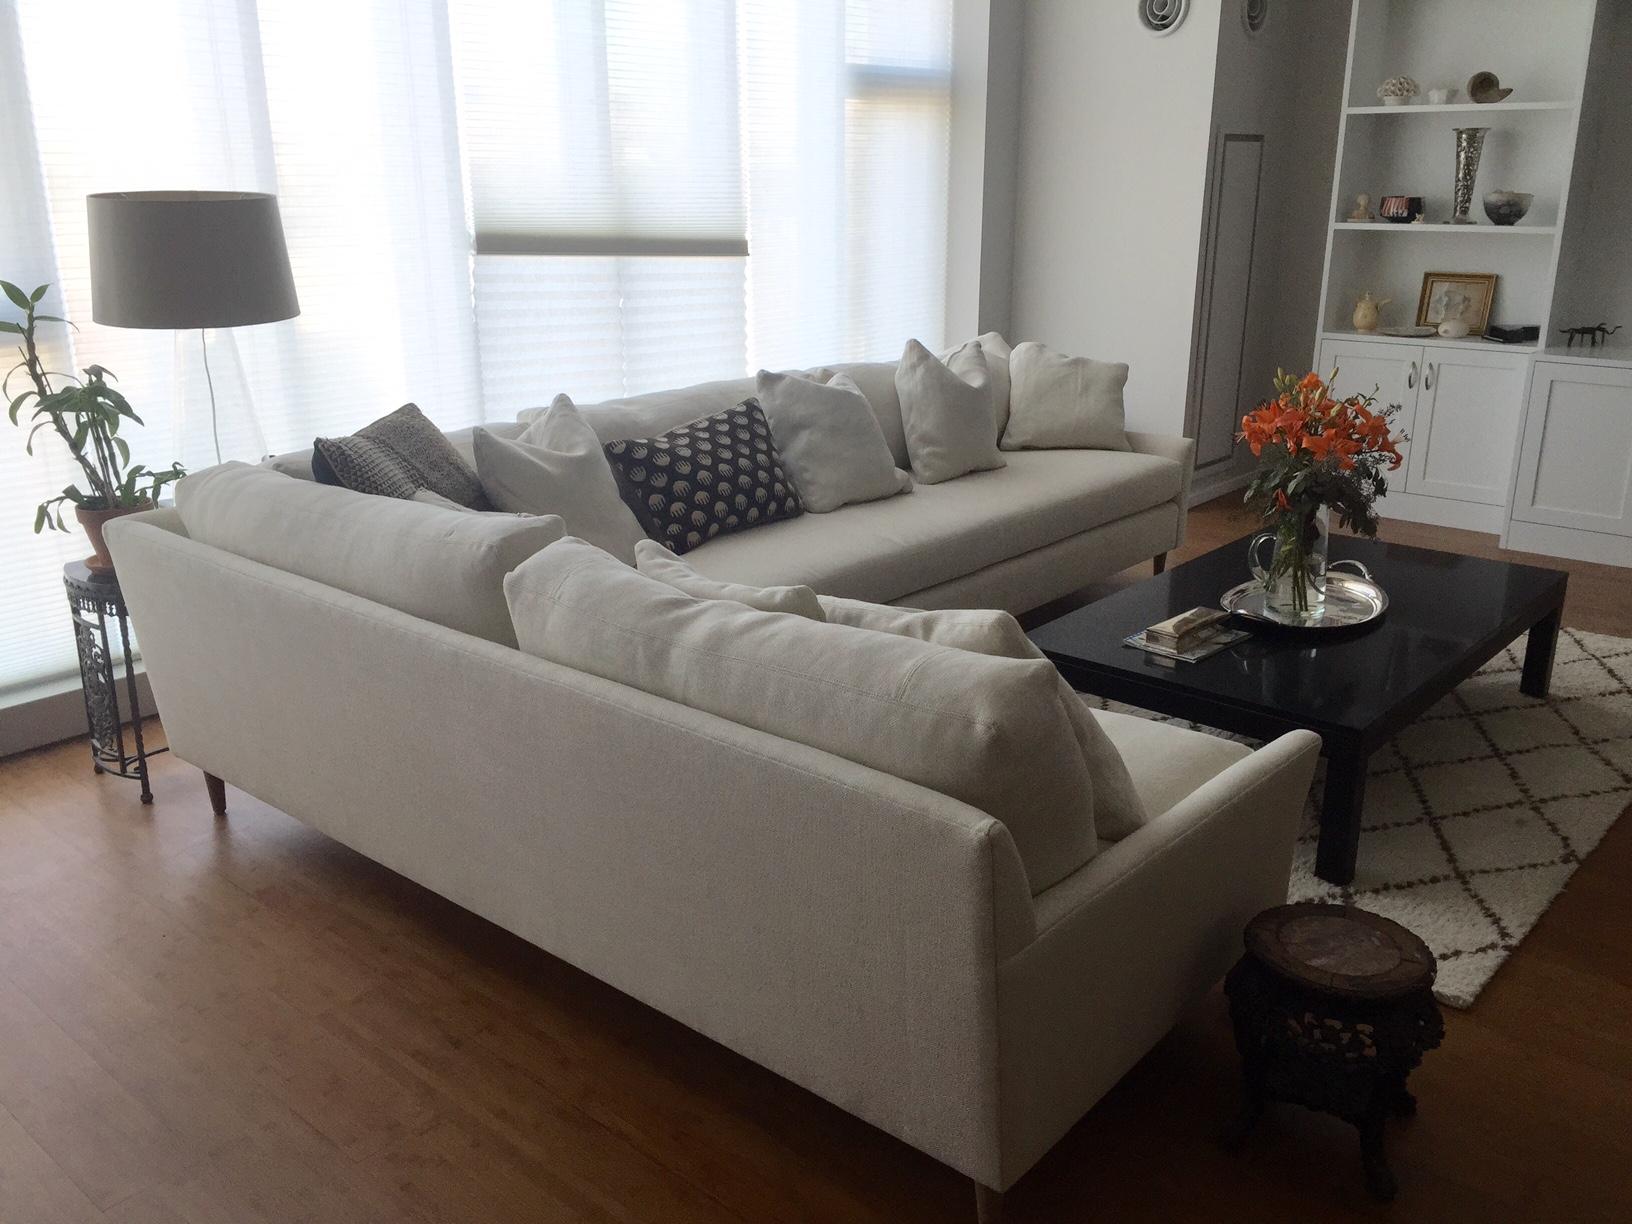 Blanche Sectional Sofa Verellen Fb Uph